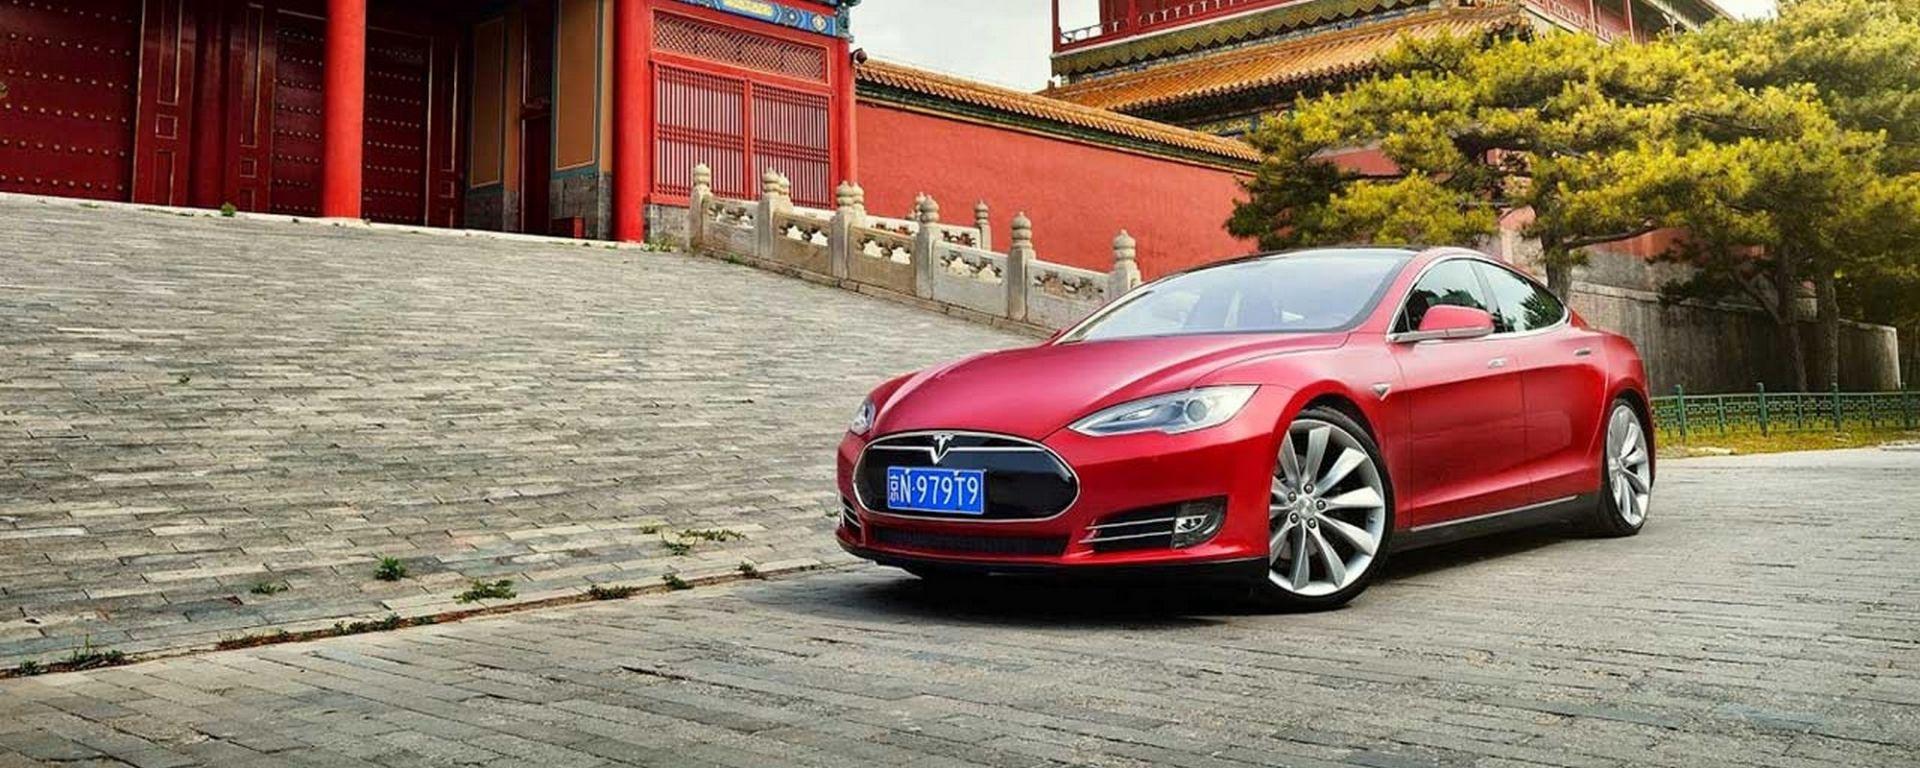 Tesla, nuovo impianto in Cina